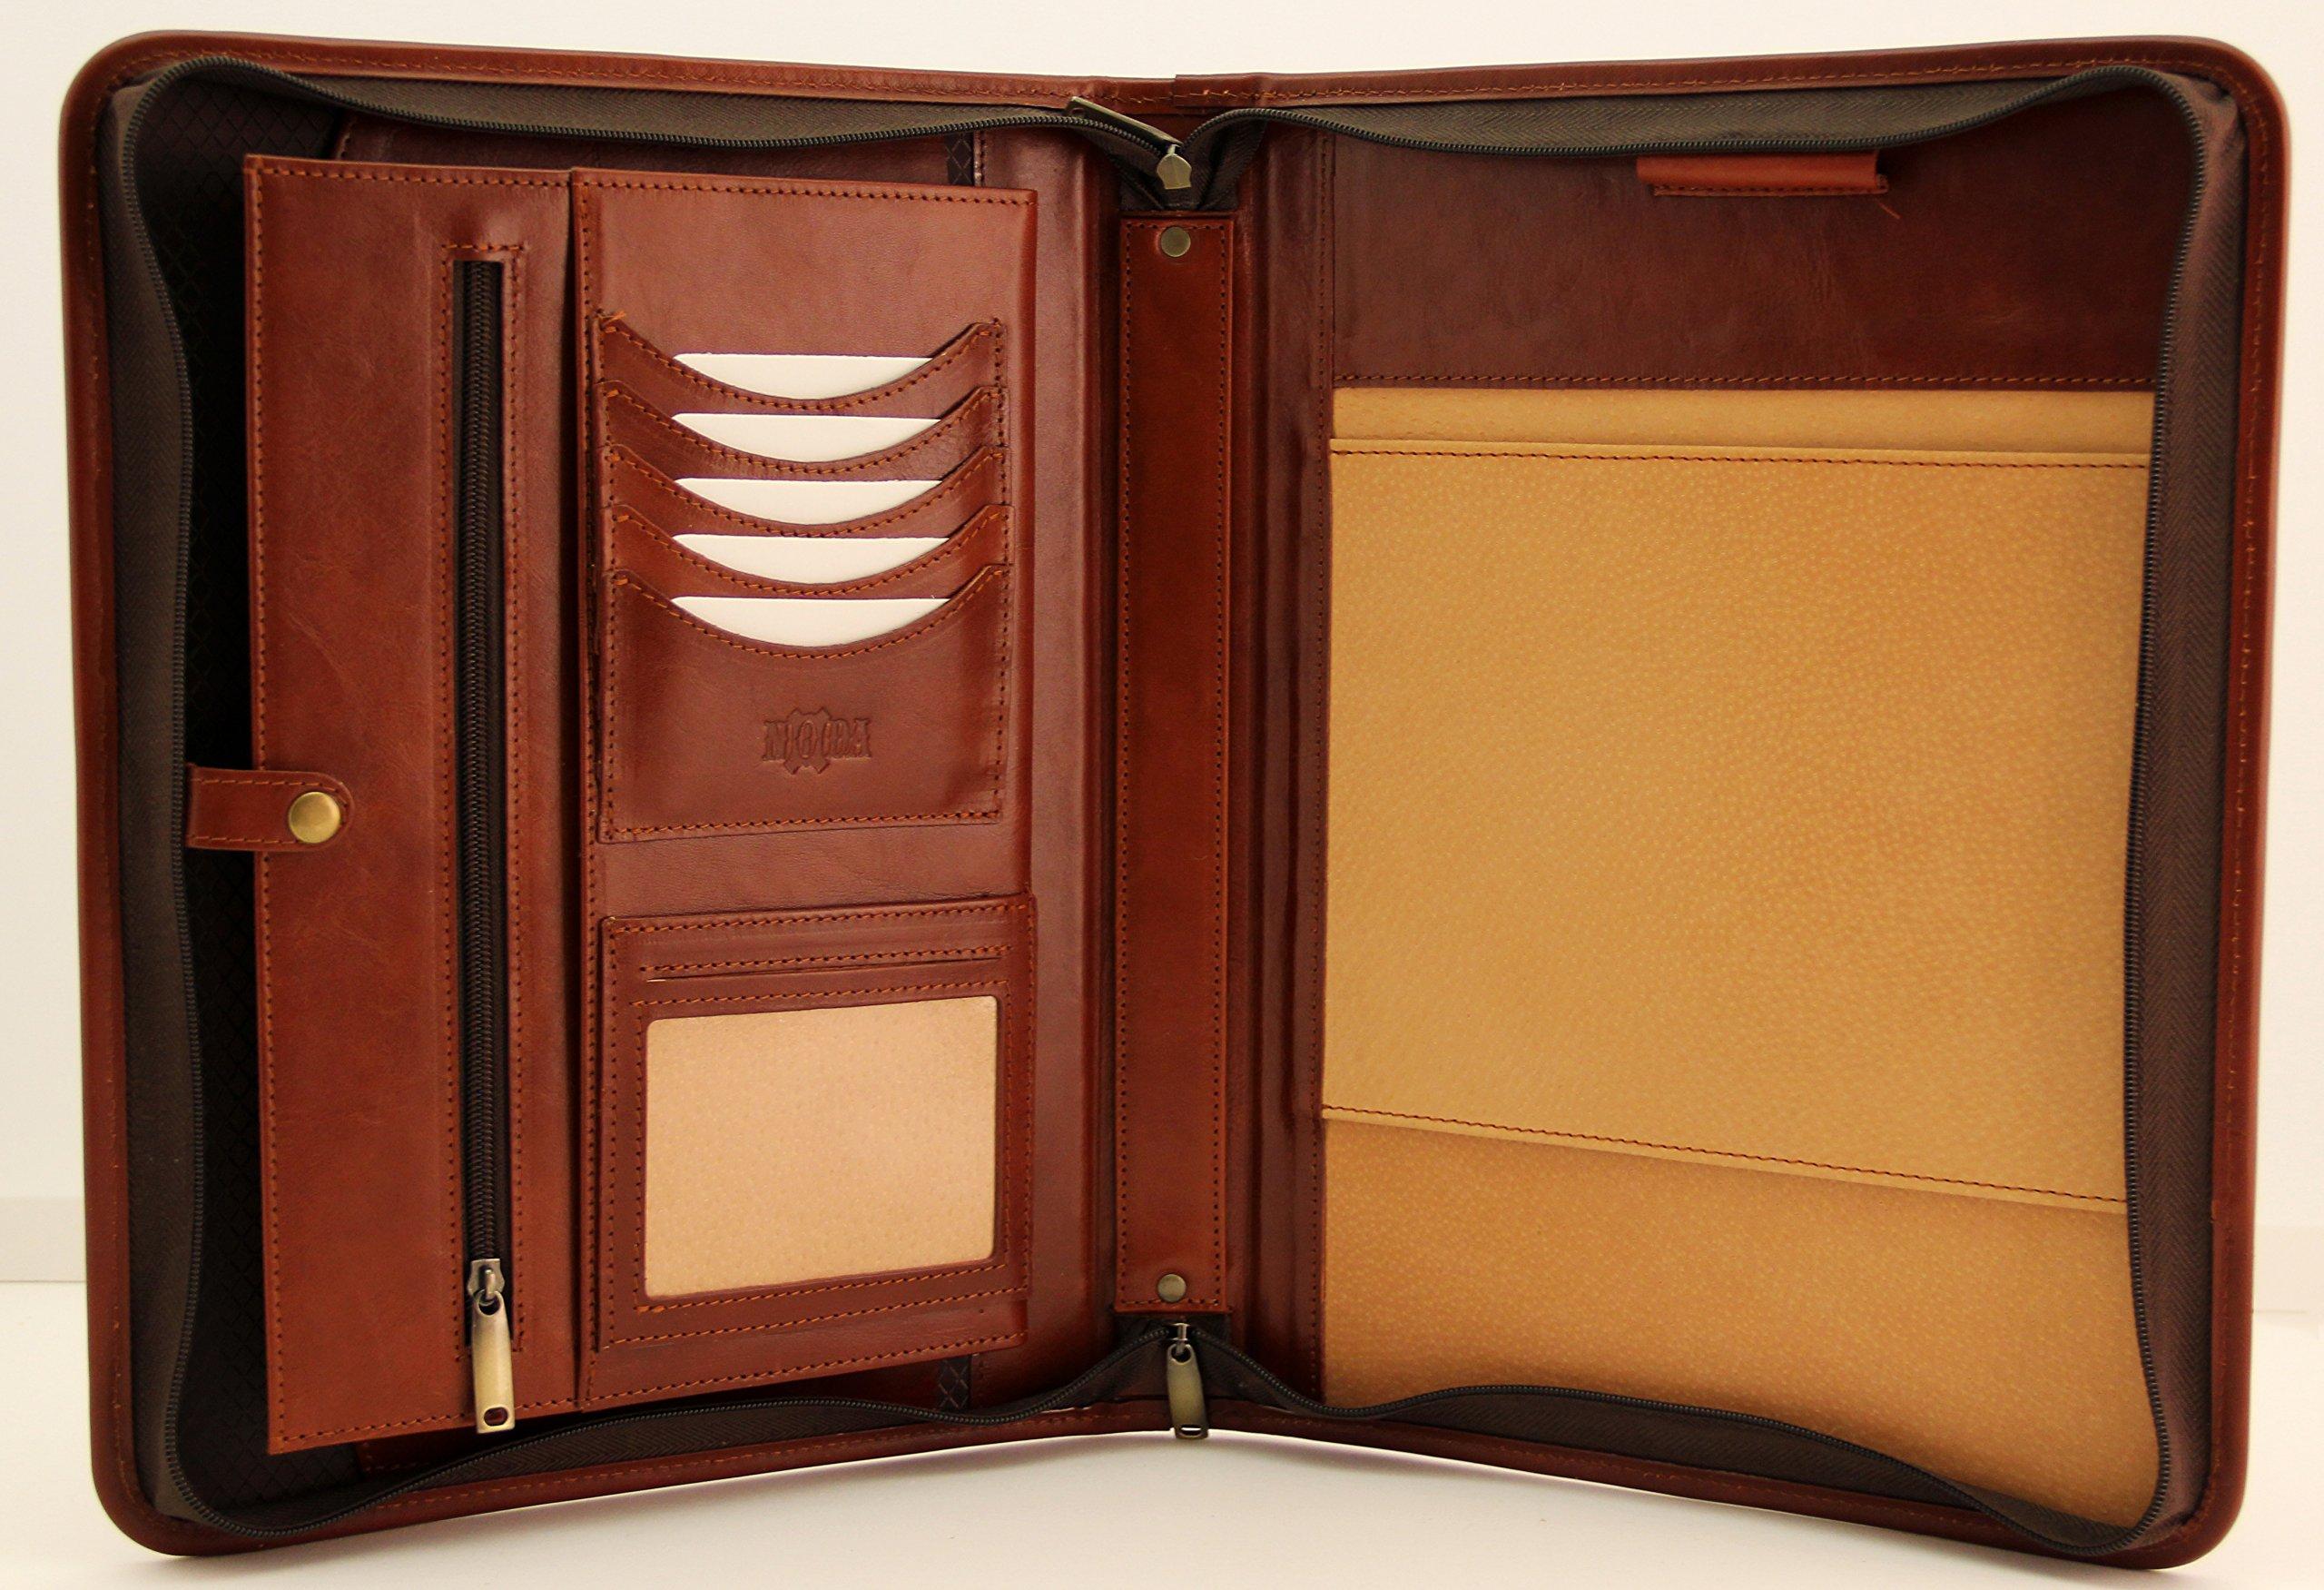 Noda Professional Padfolio - Resume Portfolio / Business Portfolio with Secure Zippered Closure, Expandable Document Organizer & Writing Pad, Italian Genuine leather conference folder A4 (Cogniac)